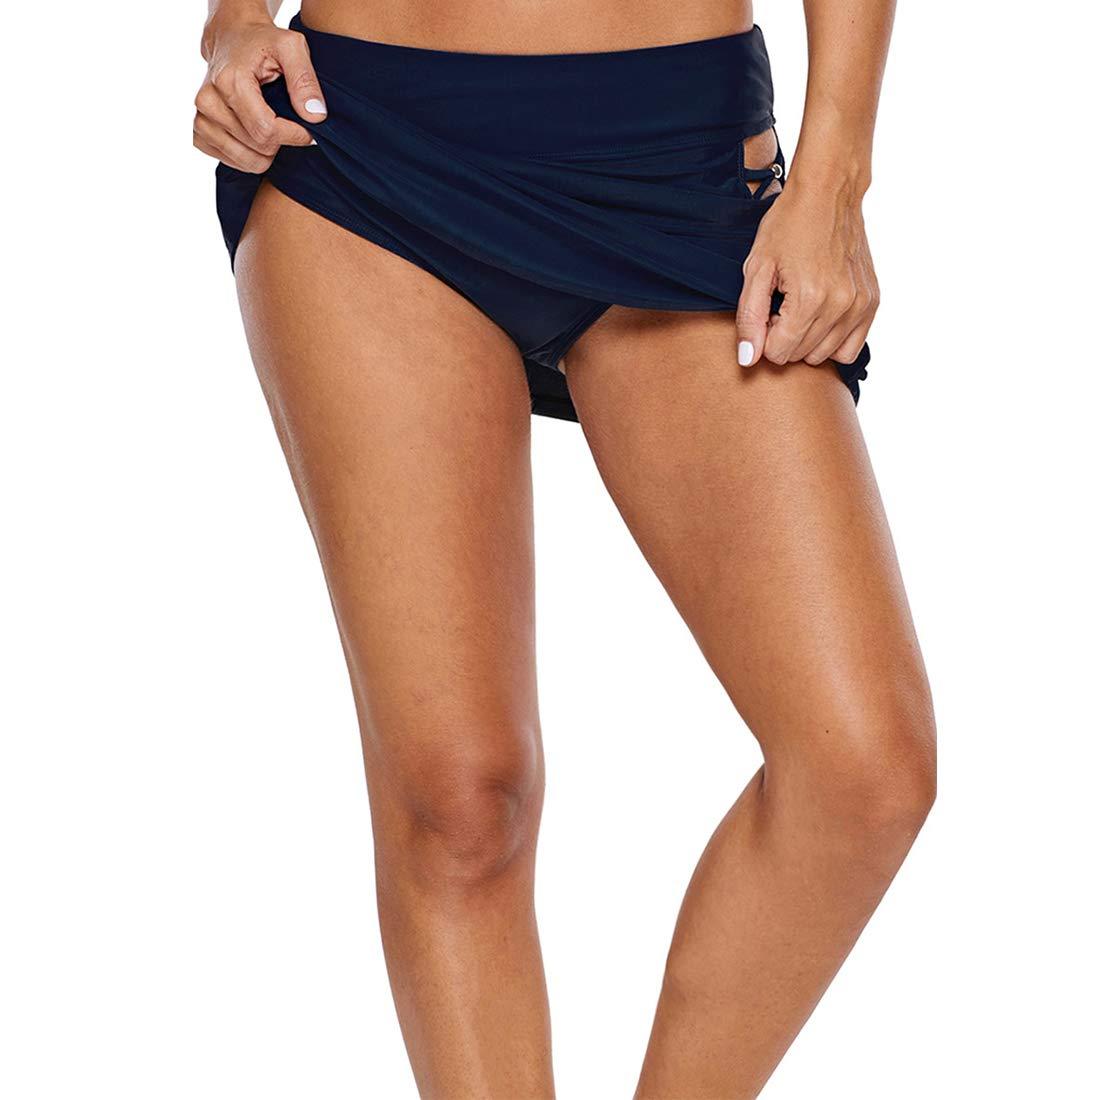 GWELL Damen Hollow Baderock A-Linie Badeshorts Badehose Figurformend Strandrock Bikinirock Schwimmrock Hotpants